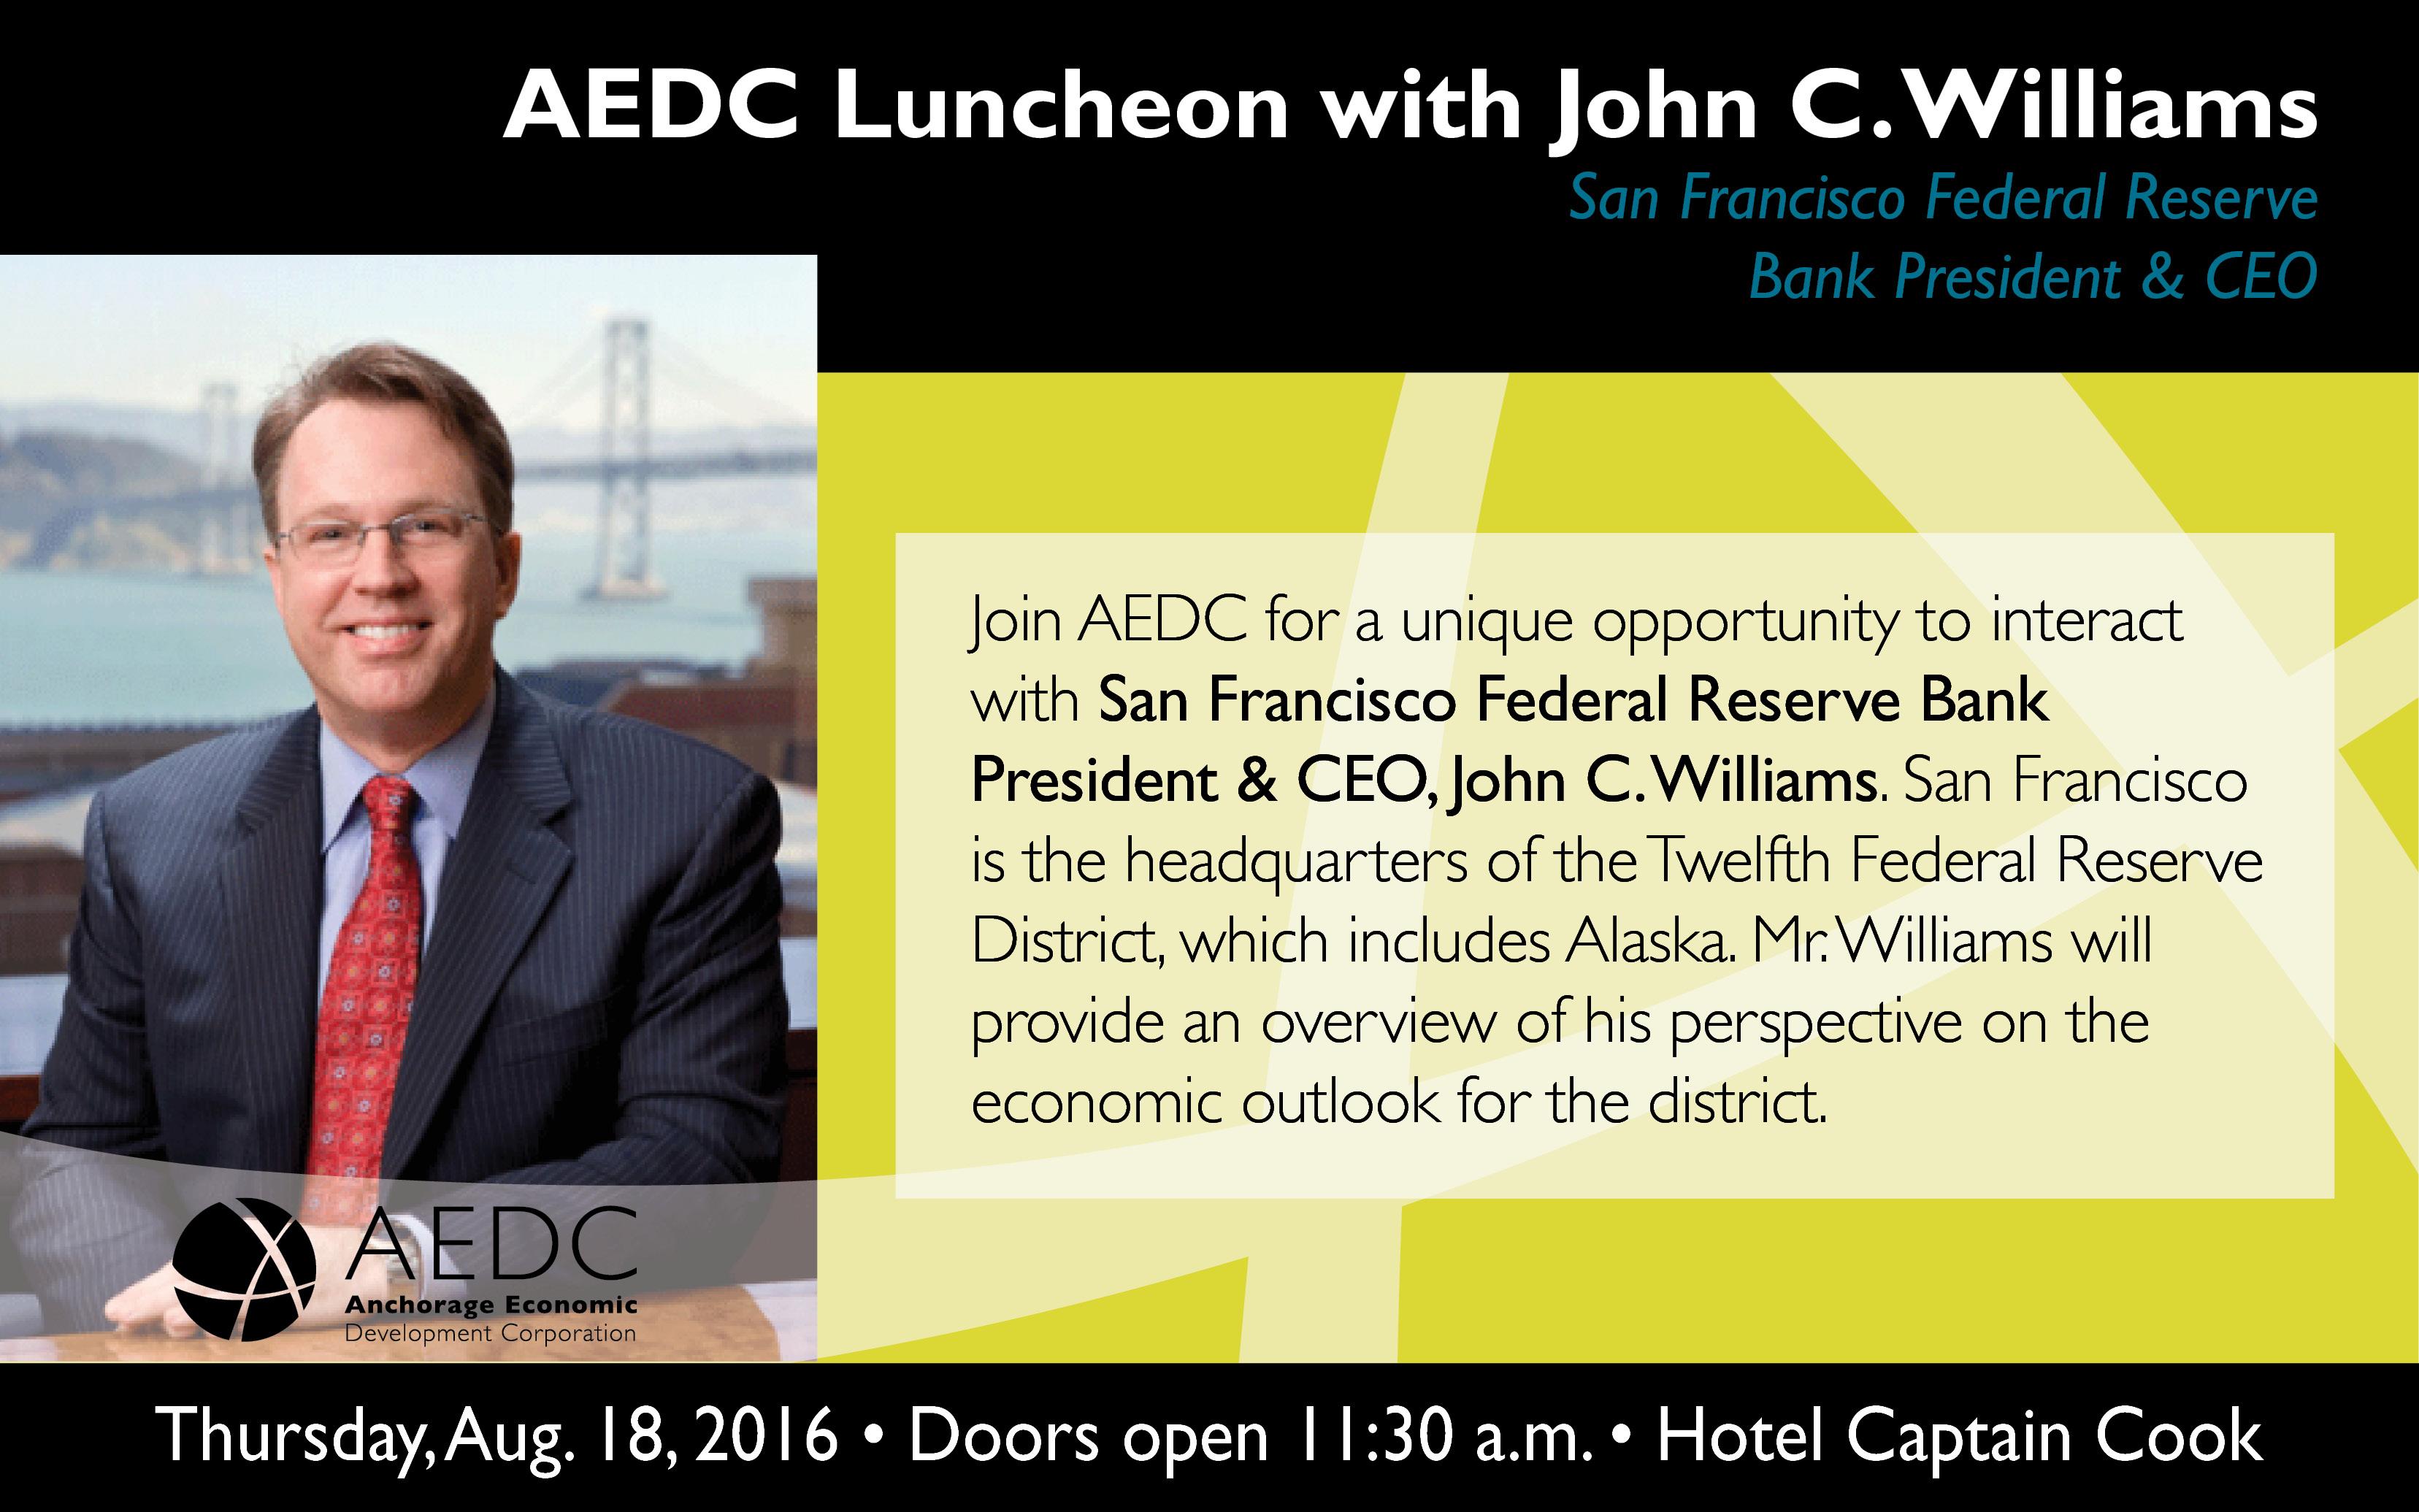 2016 AEDC Luncheon